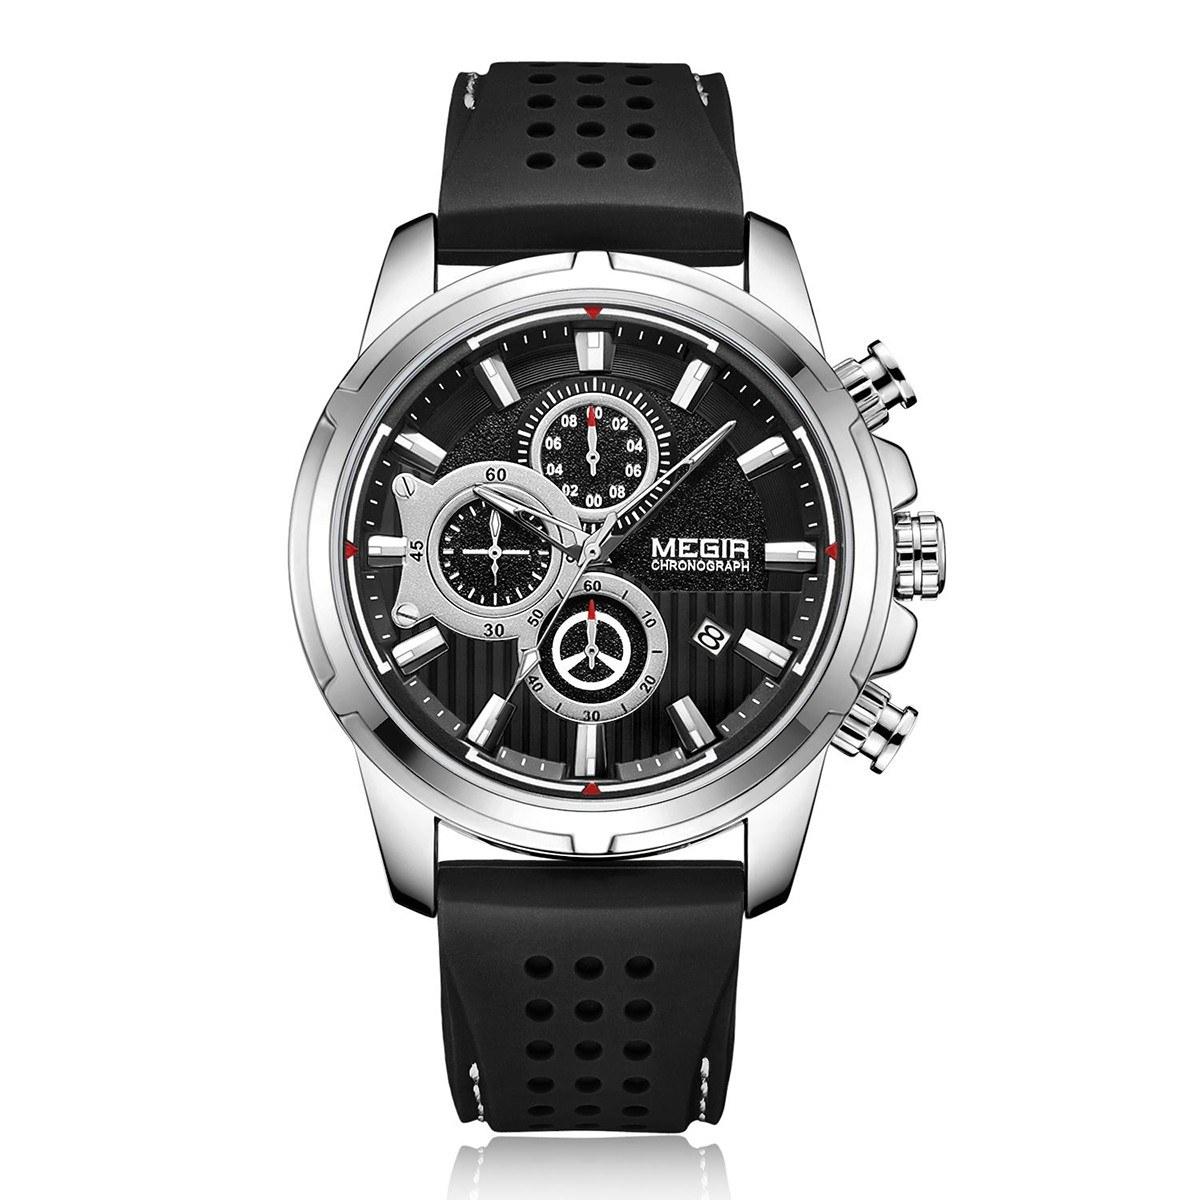 megir 2101 Business Quartz Sports Men Watch 3ATM Waterproof Big Dial Large Face Wrist Watch Microsecond Second Minute Chronograph Sub-dials Calendar Clock for Men with Silicone Strap Band